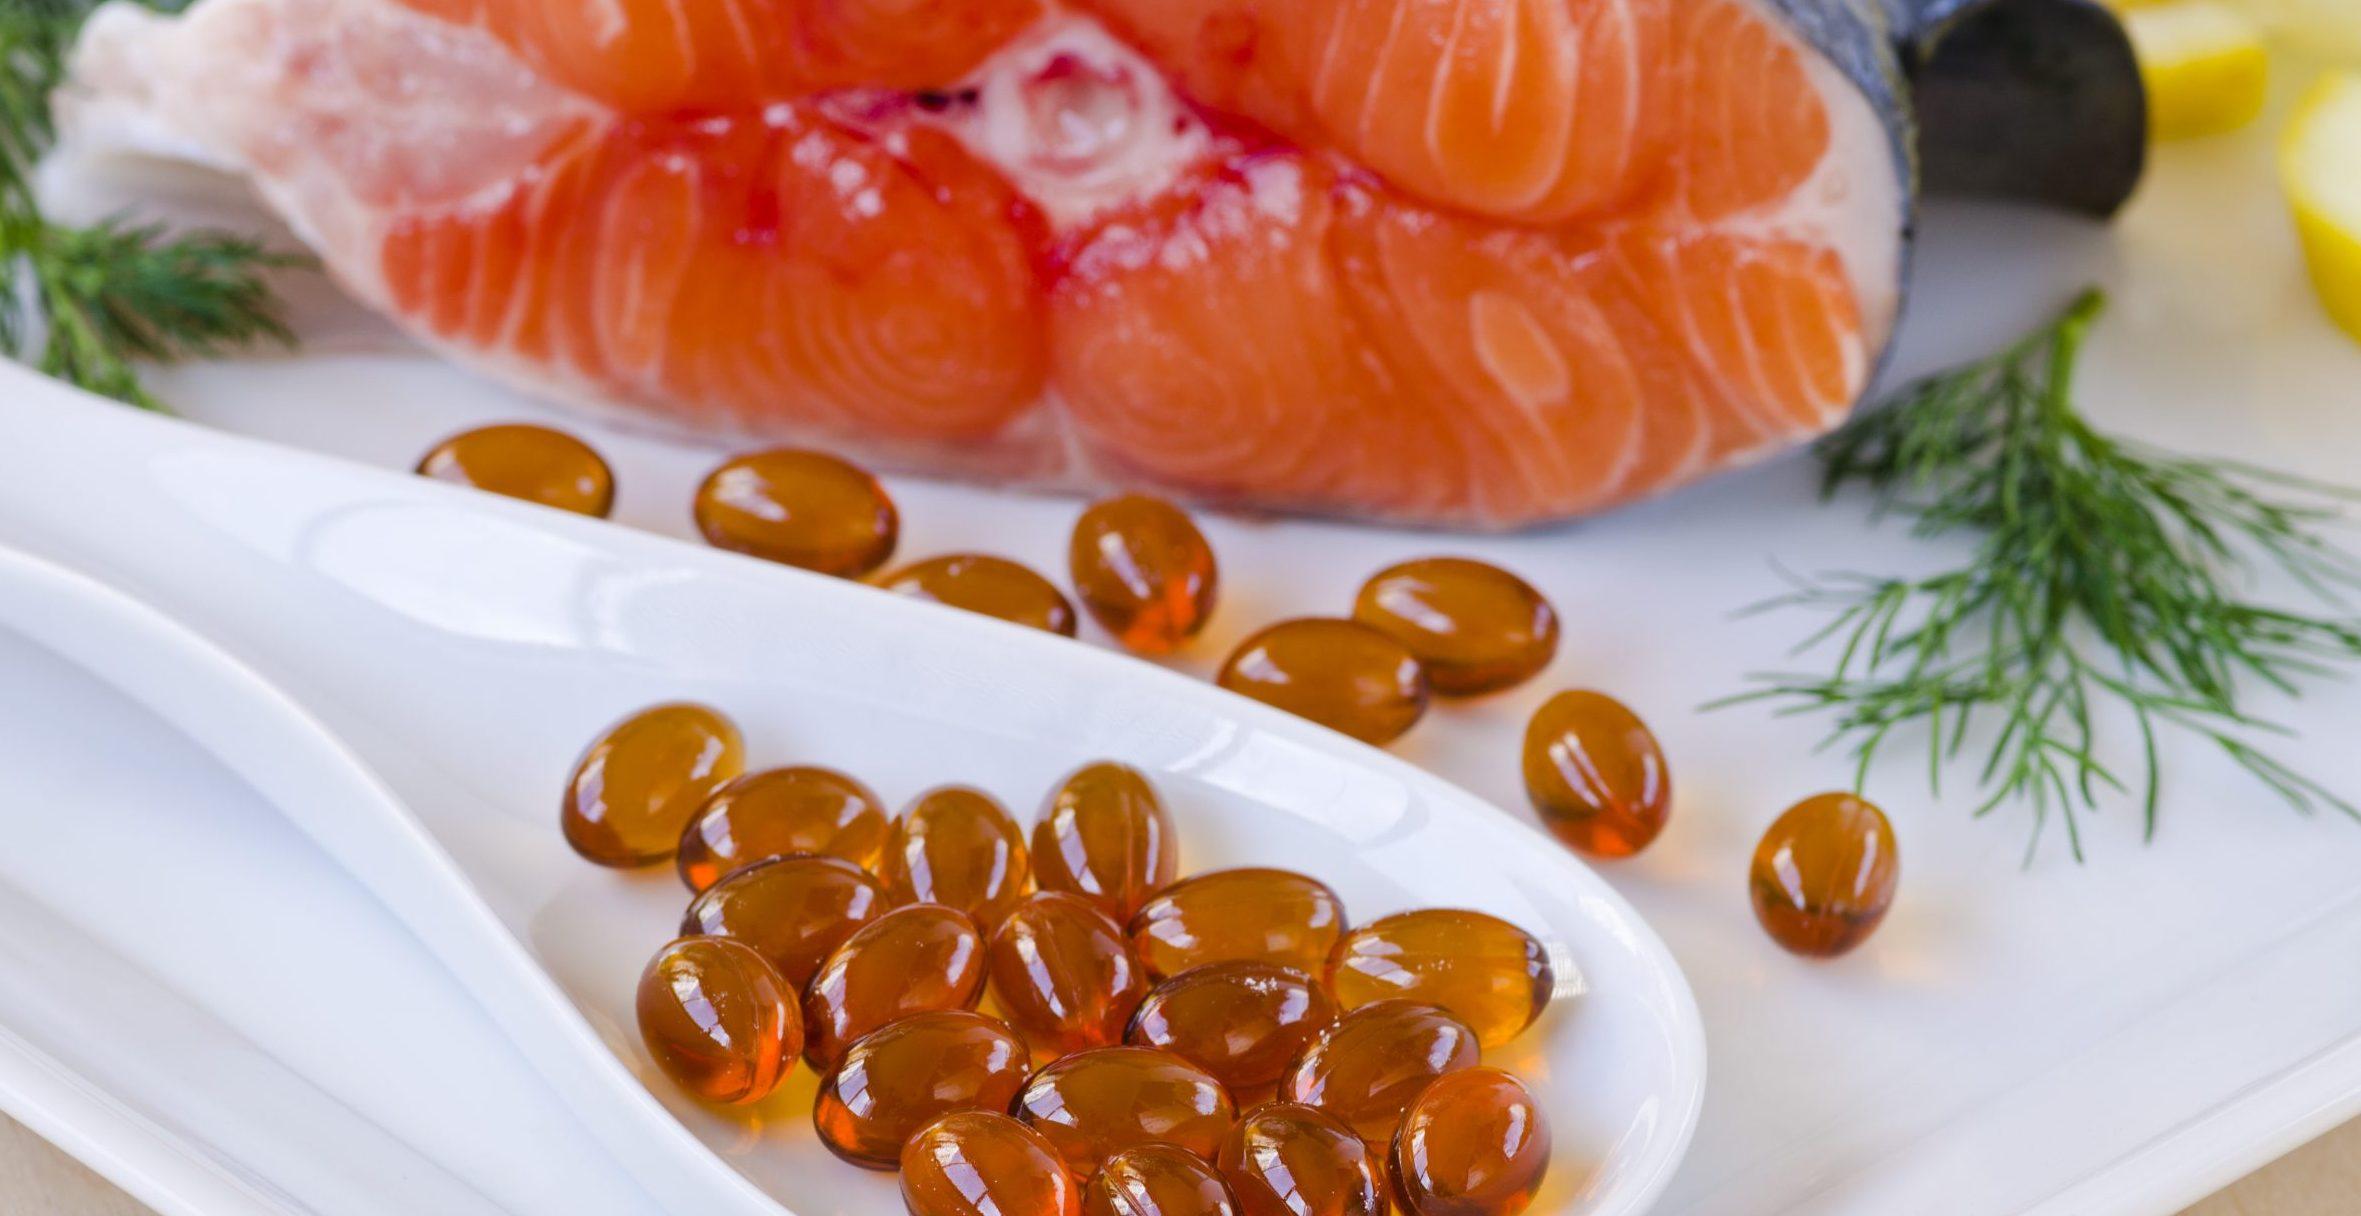 Omega 3 fish oil tablets